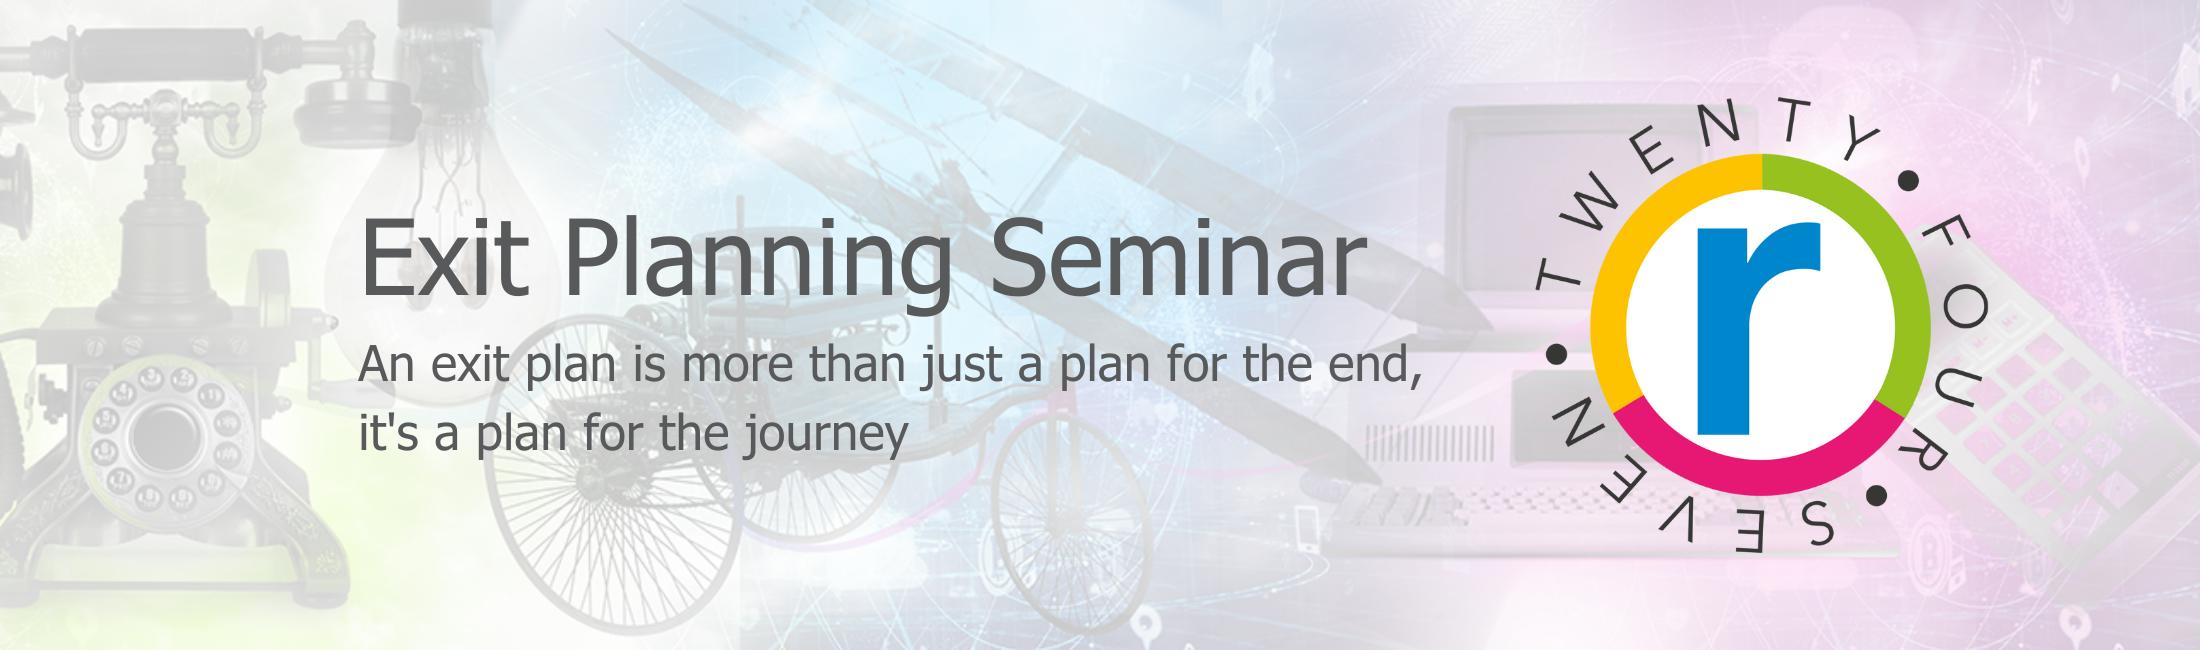 Exit Planning seminar